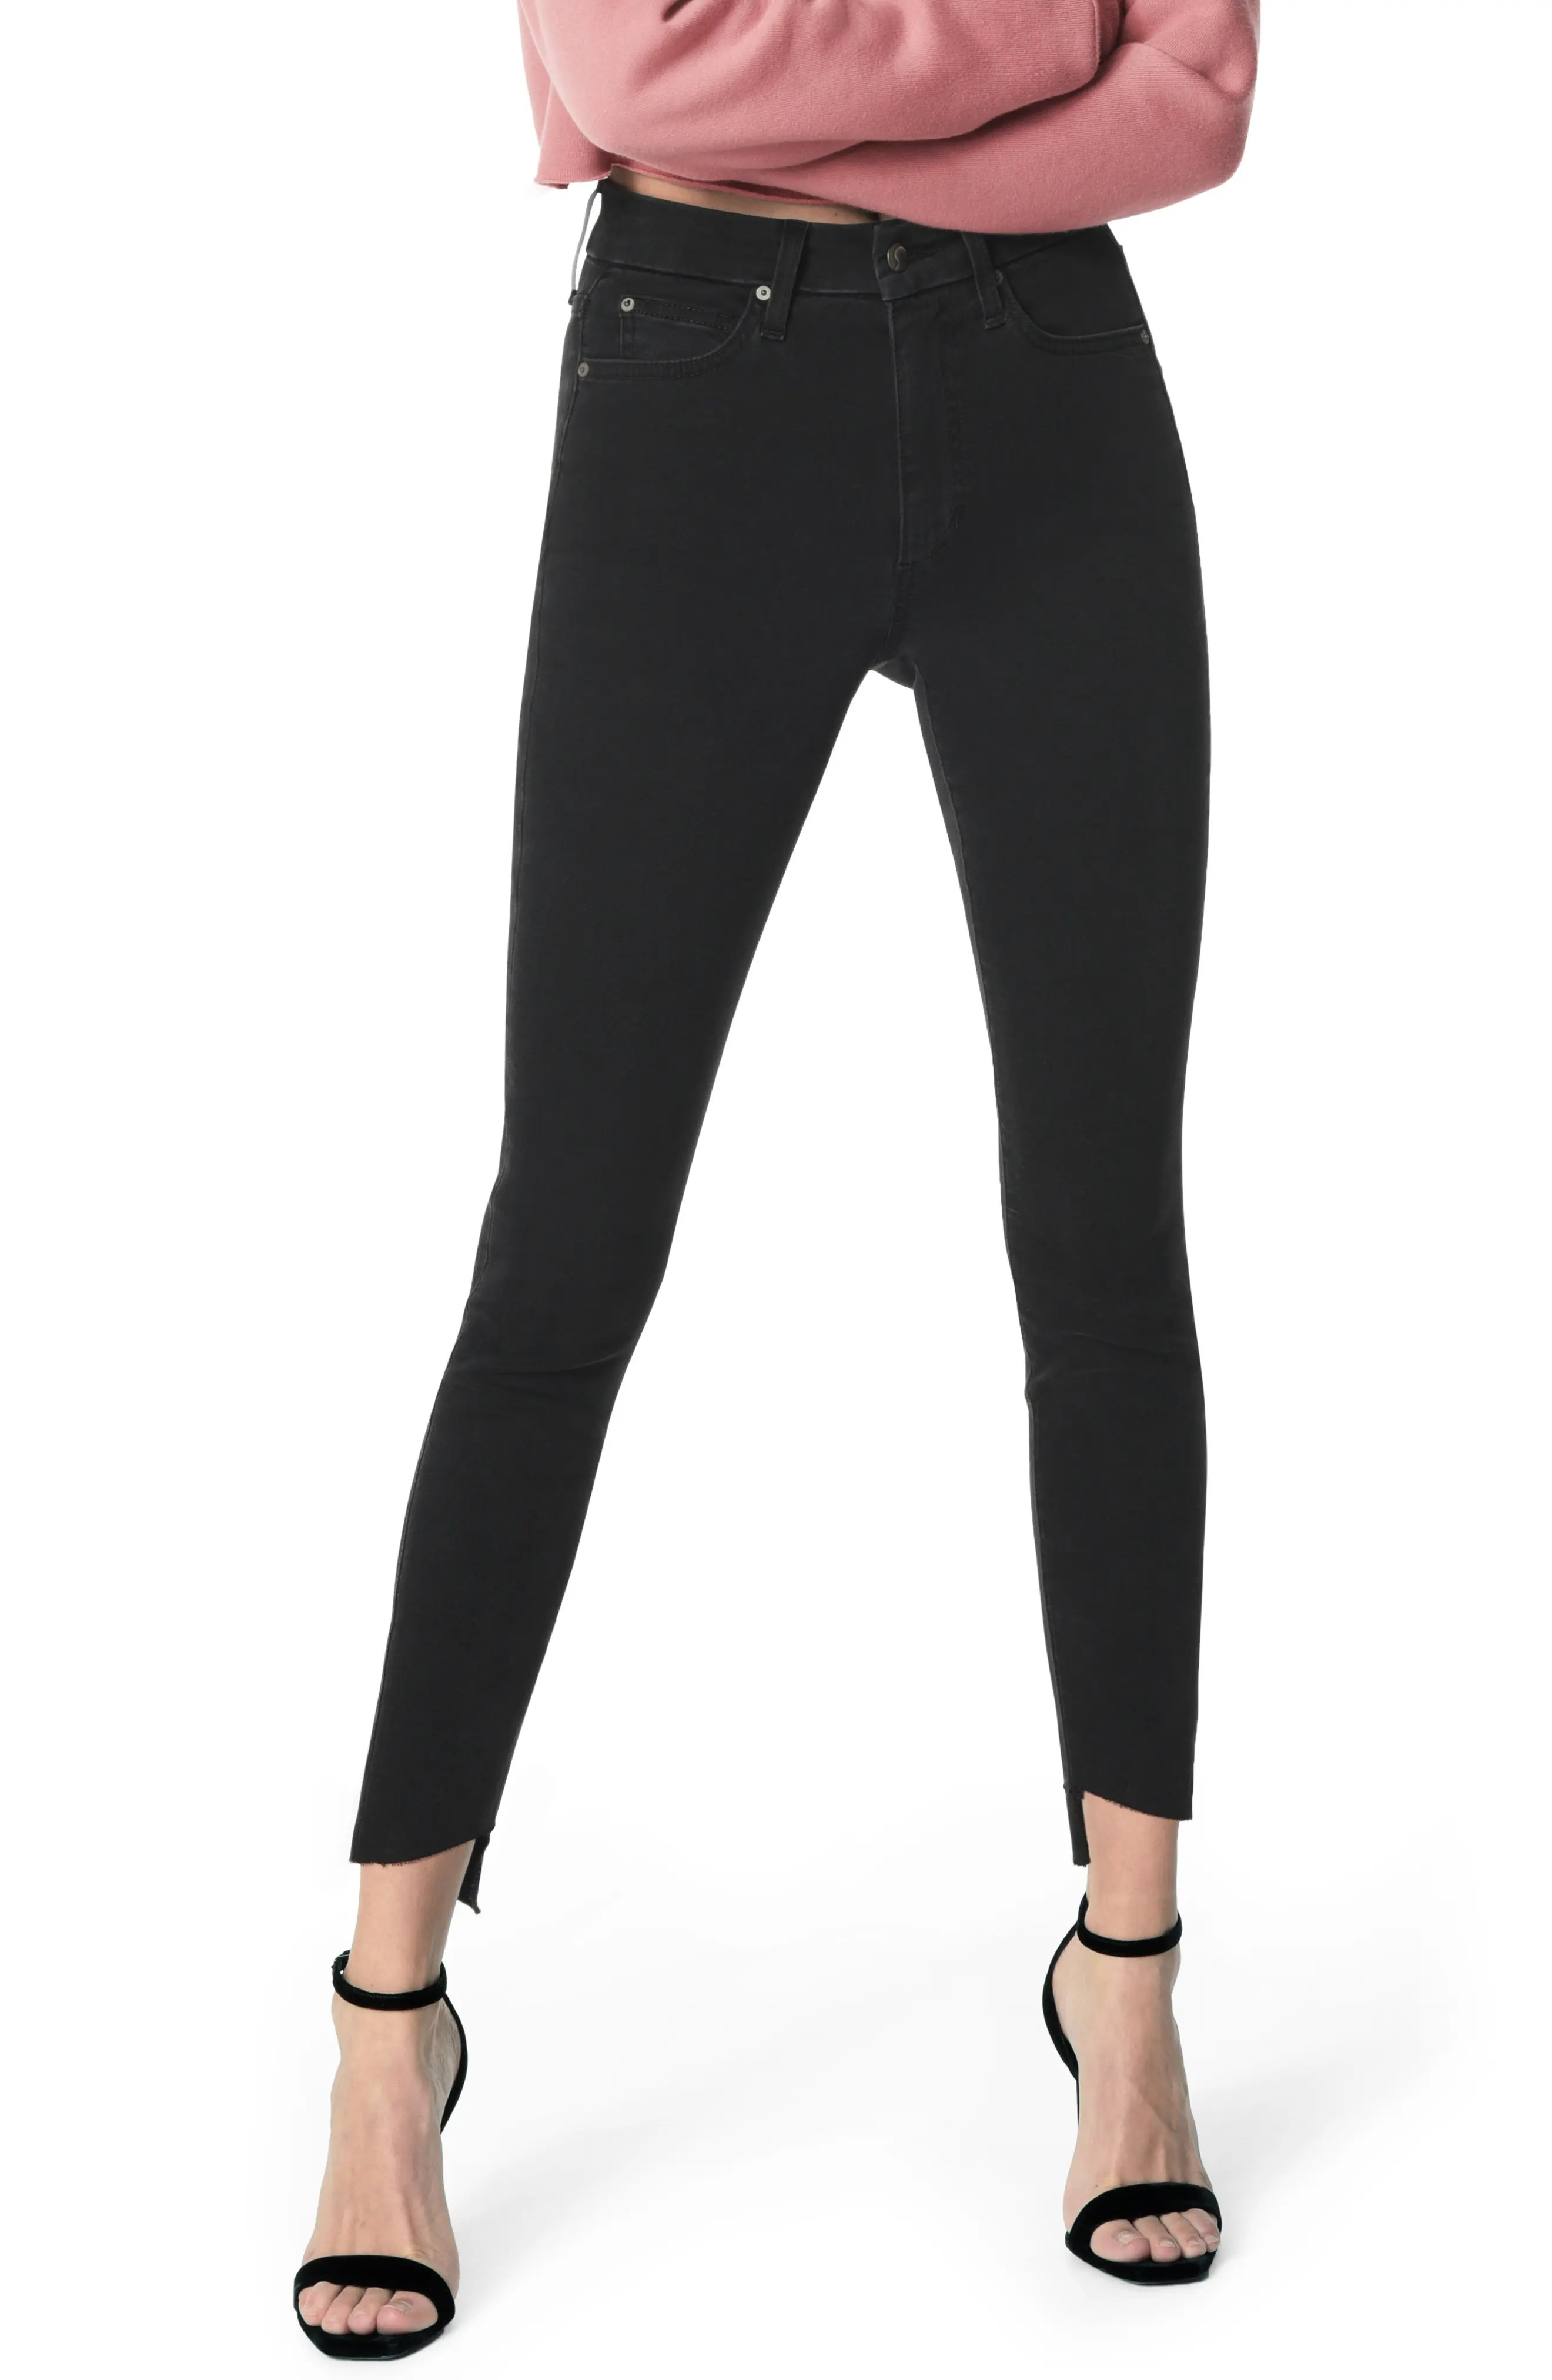 Joe   flawless honey curvy high waist ankle skinny jeans elsey also for women nordstrom rh shoprdstrom